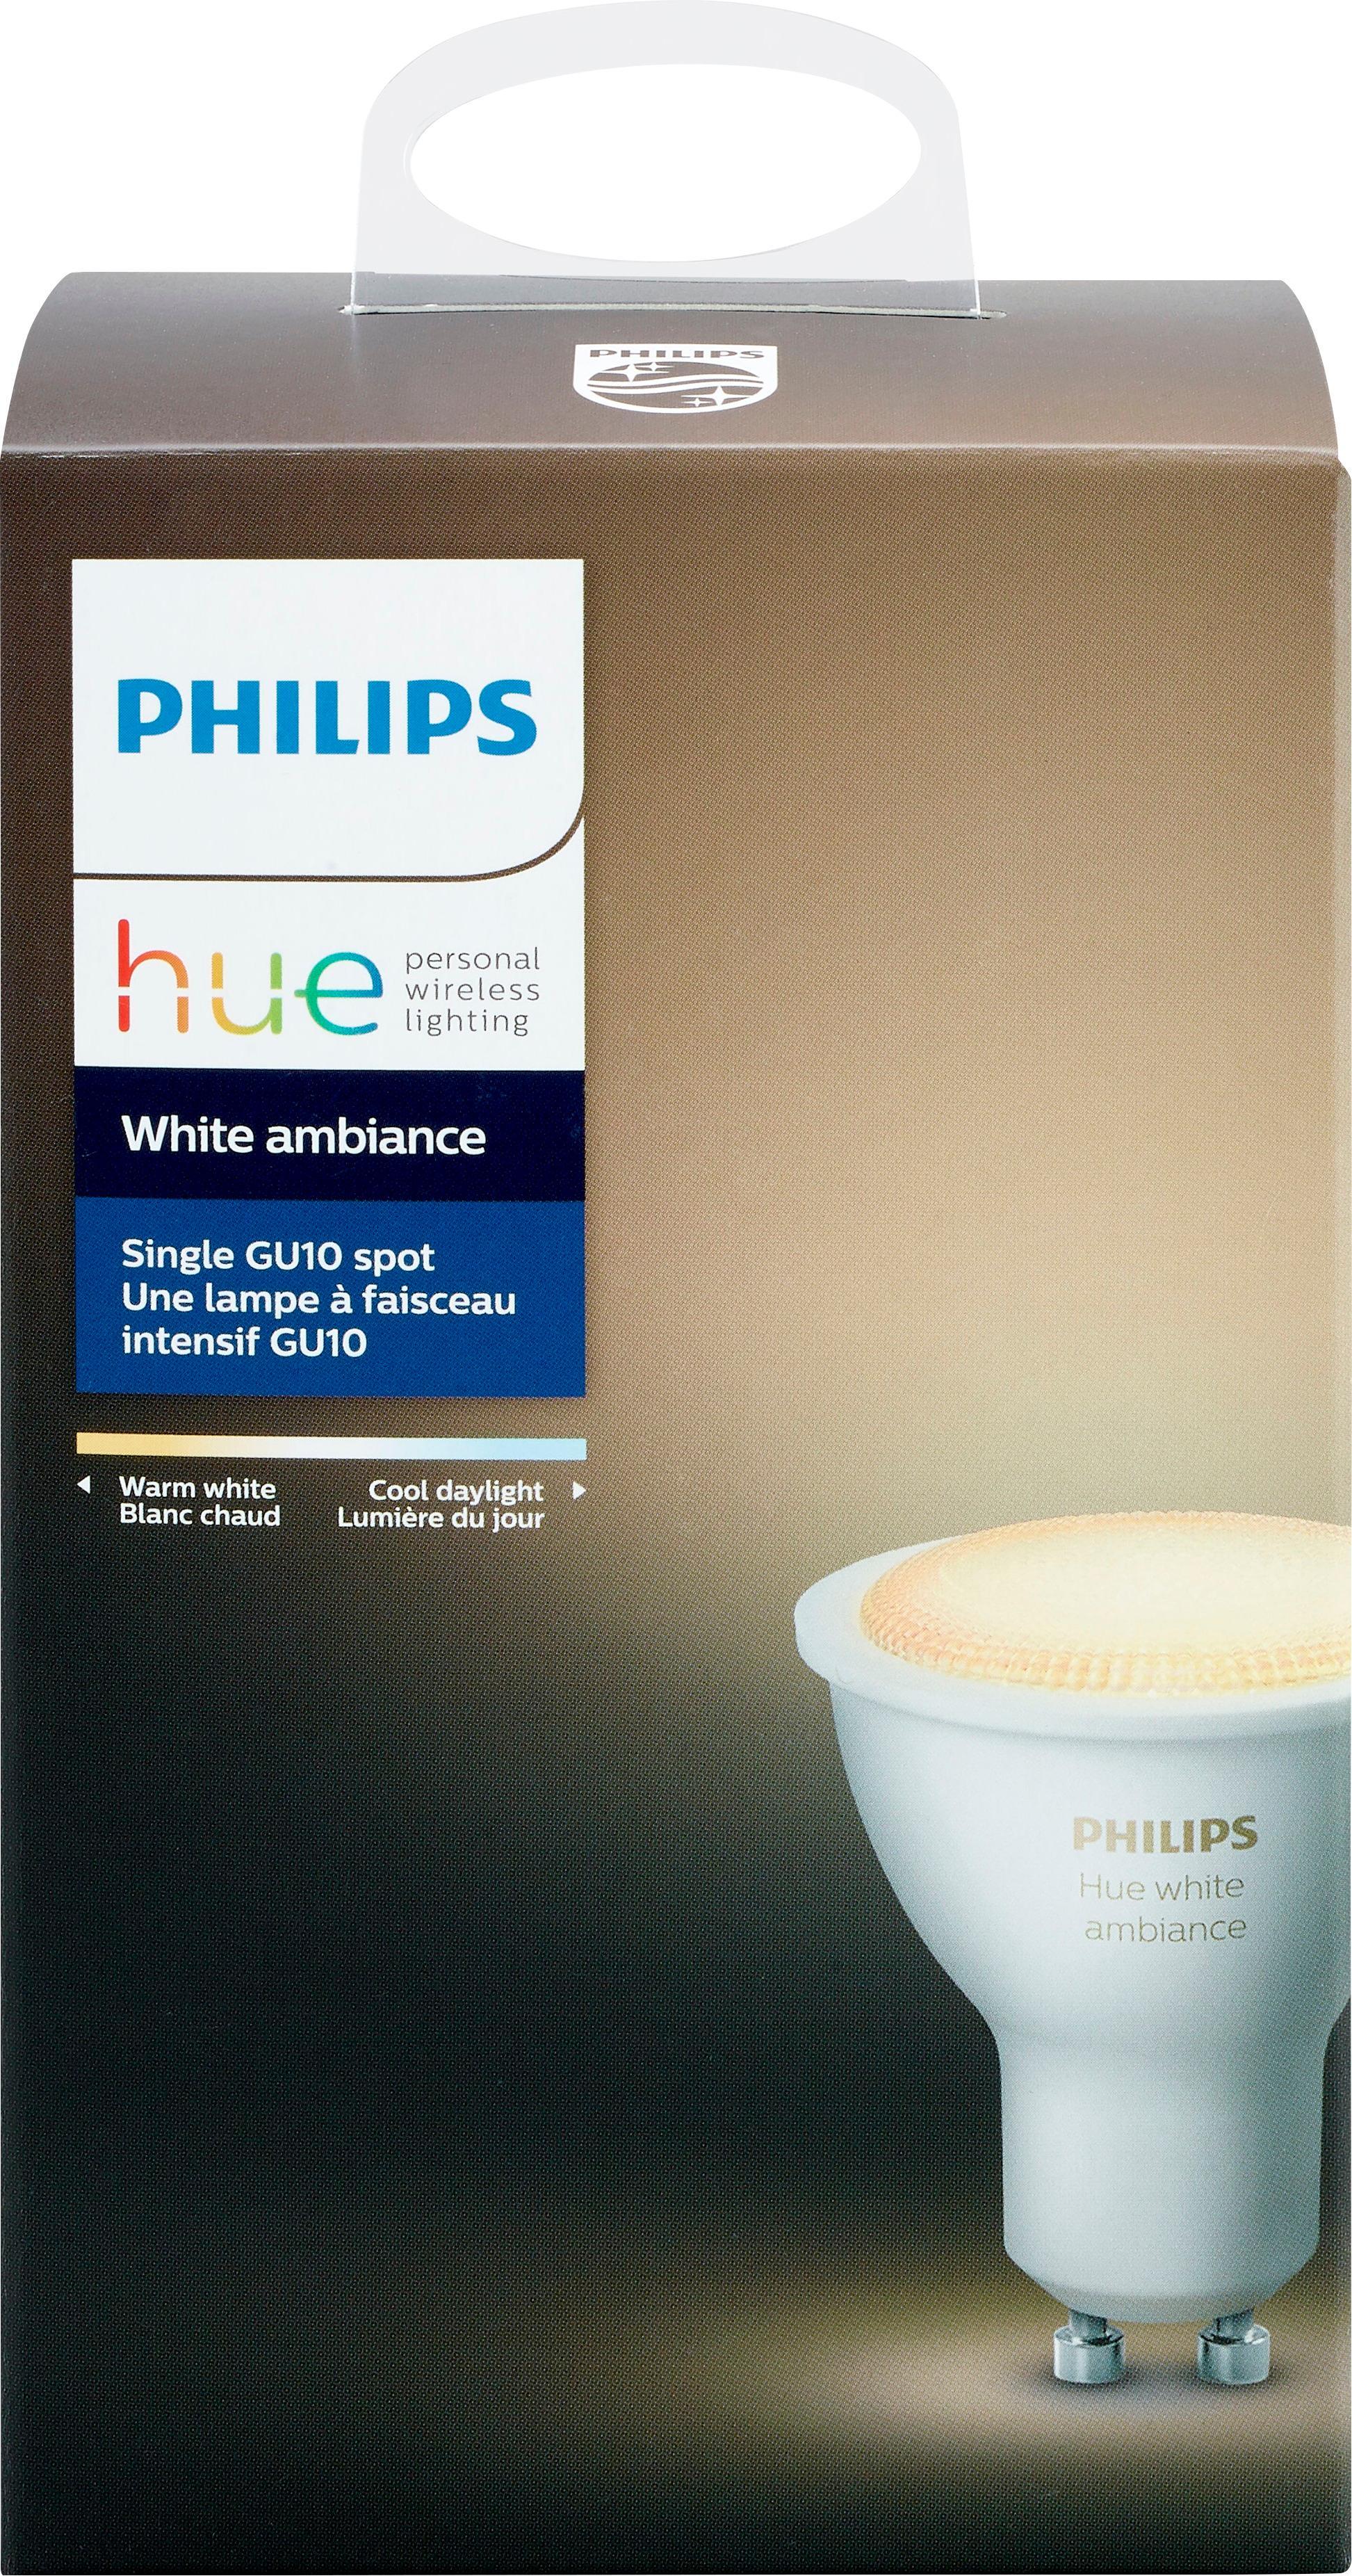 Philips Hue White Ambiance GU10 Wi-Fi Smart LED Bulb White 464677